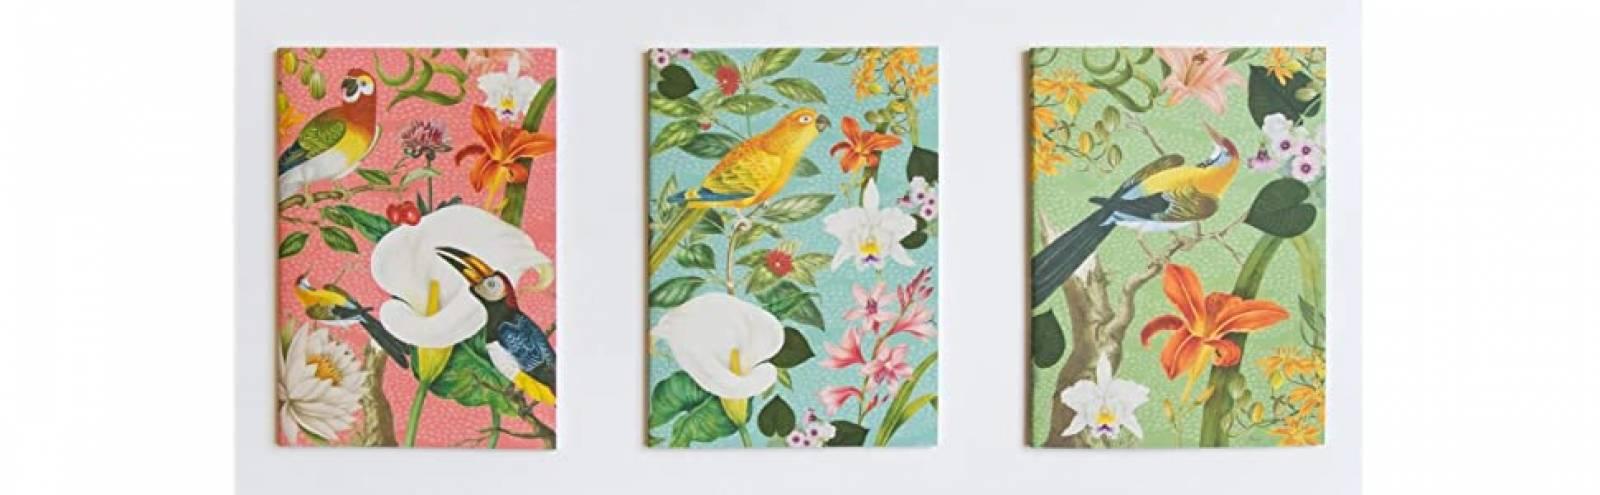 Set Of 3 Notebooks - Exotic Notebook set RHS